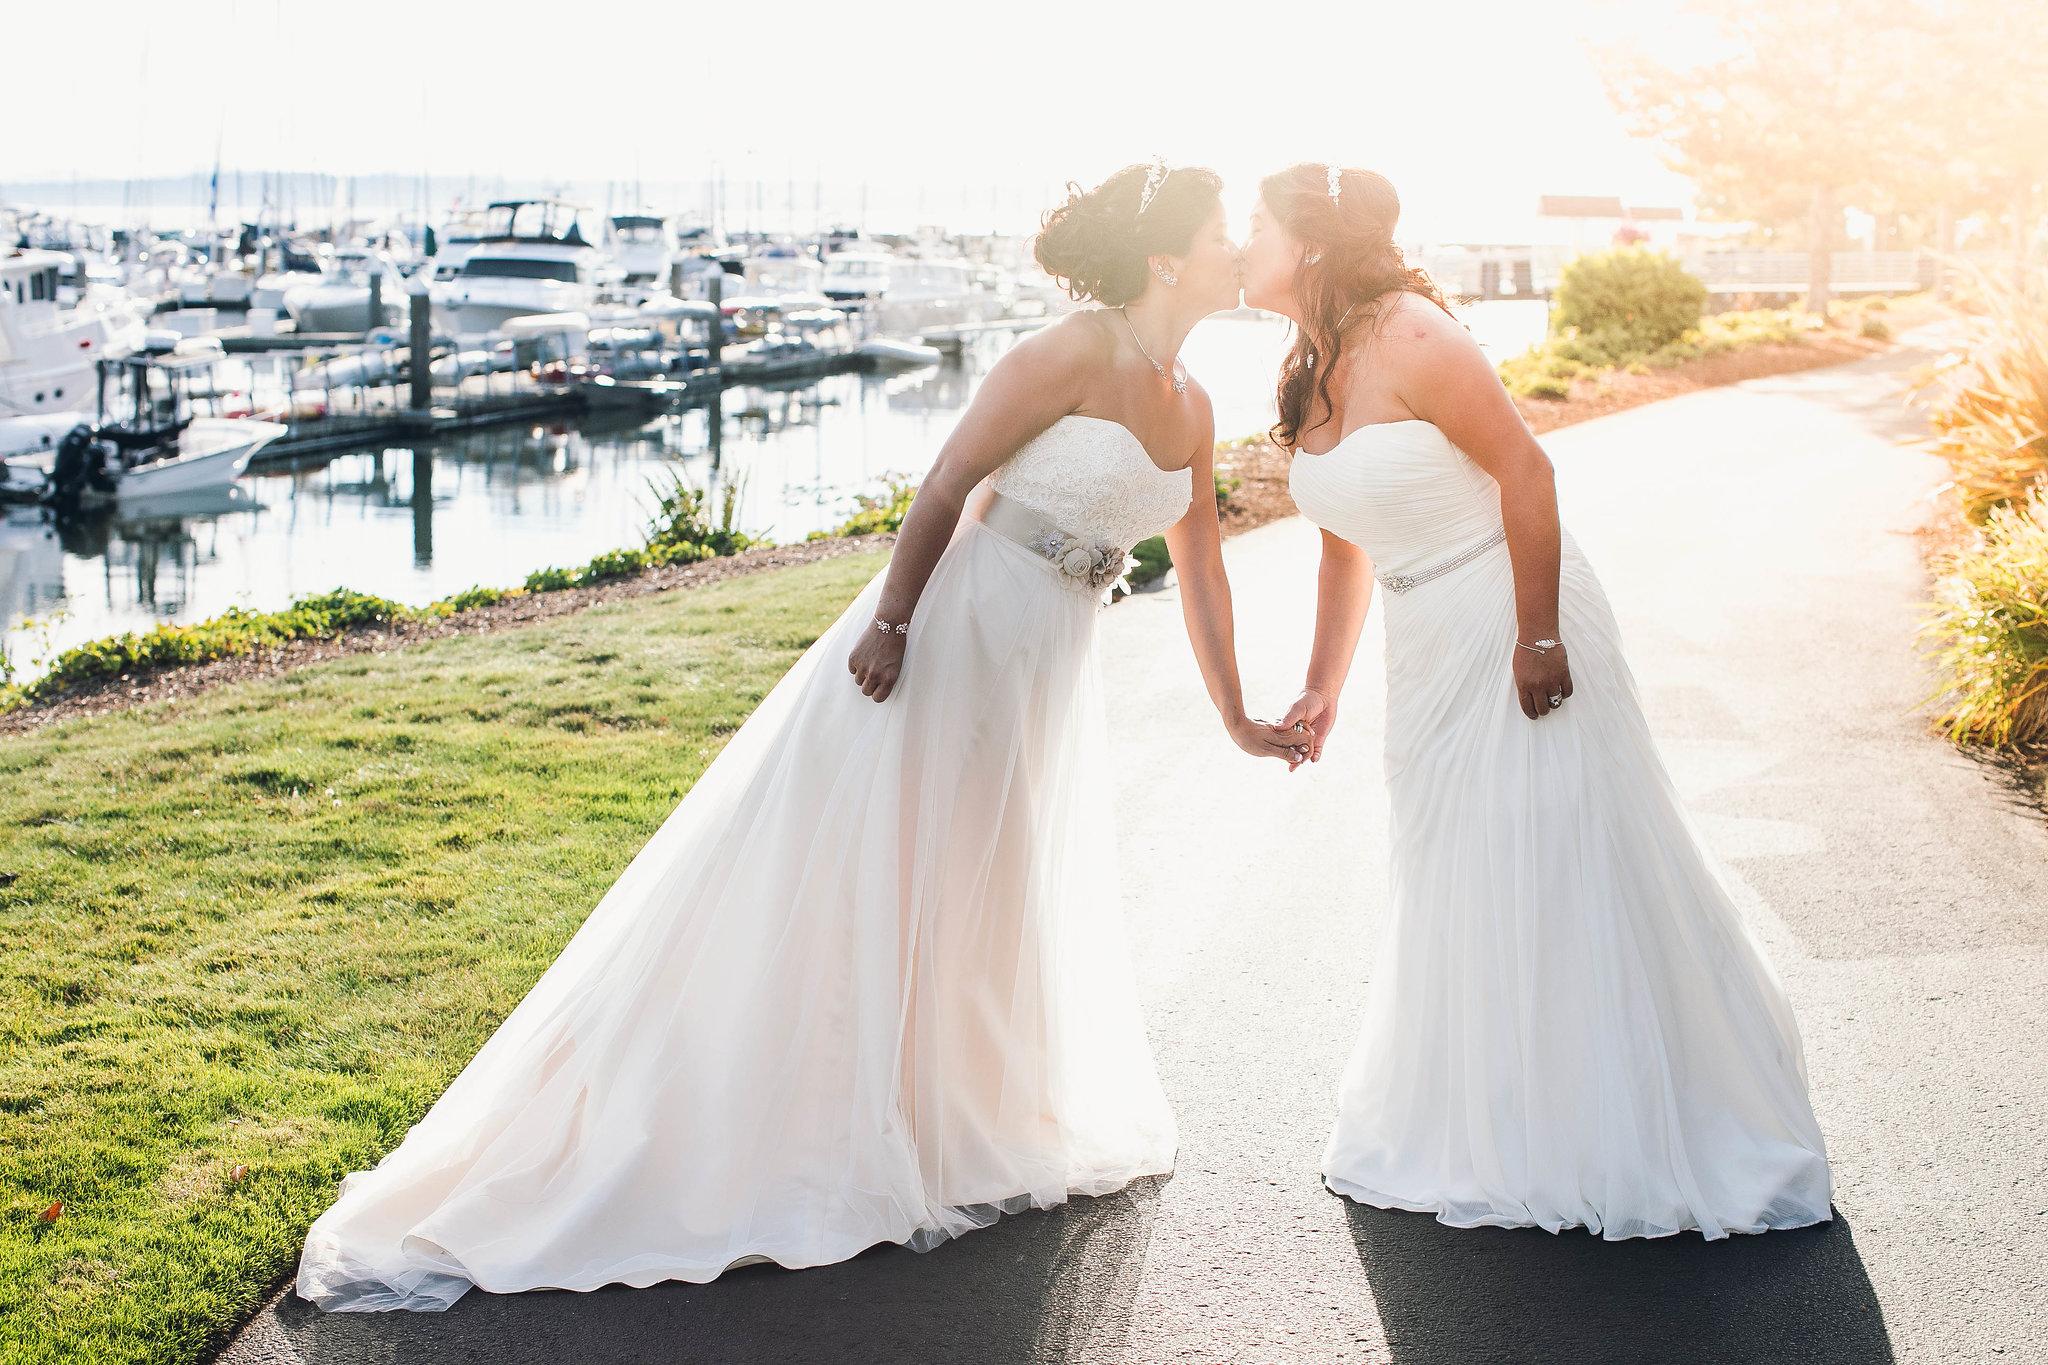 palisades-restaurant-wedding-by-seattle-wedding-photographer-adina-preston-2.jpg